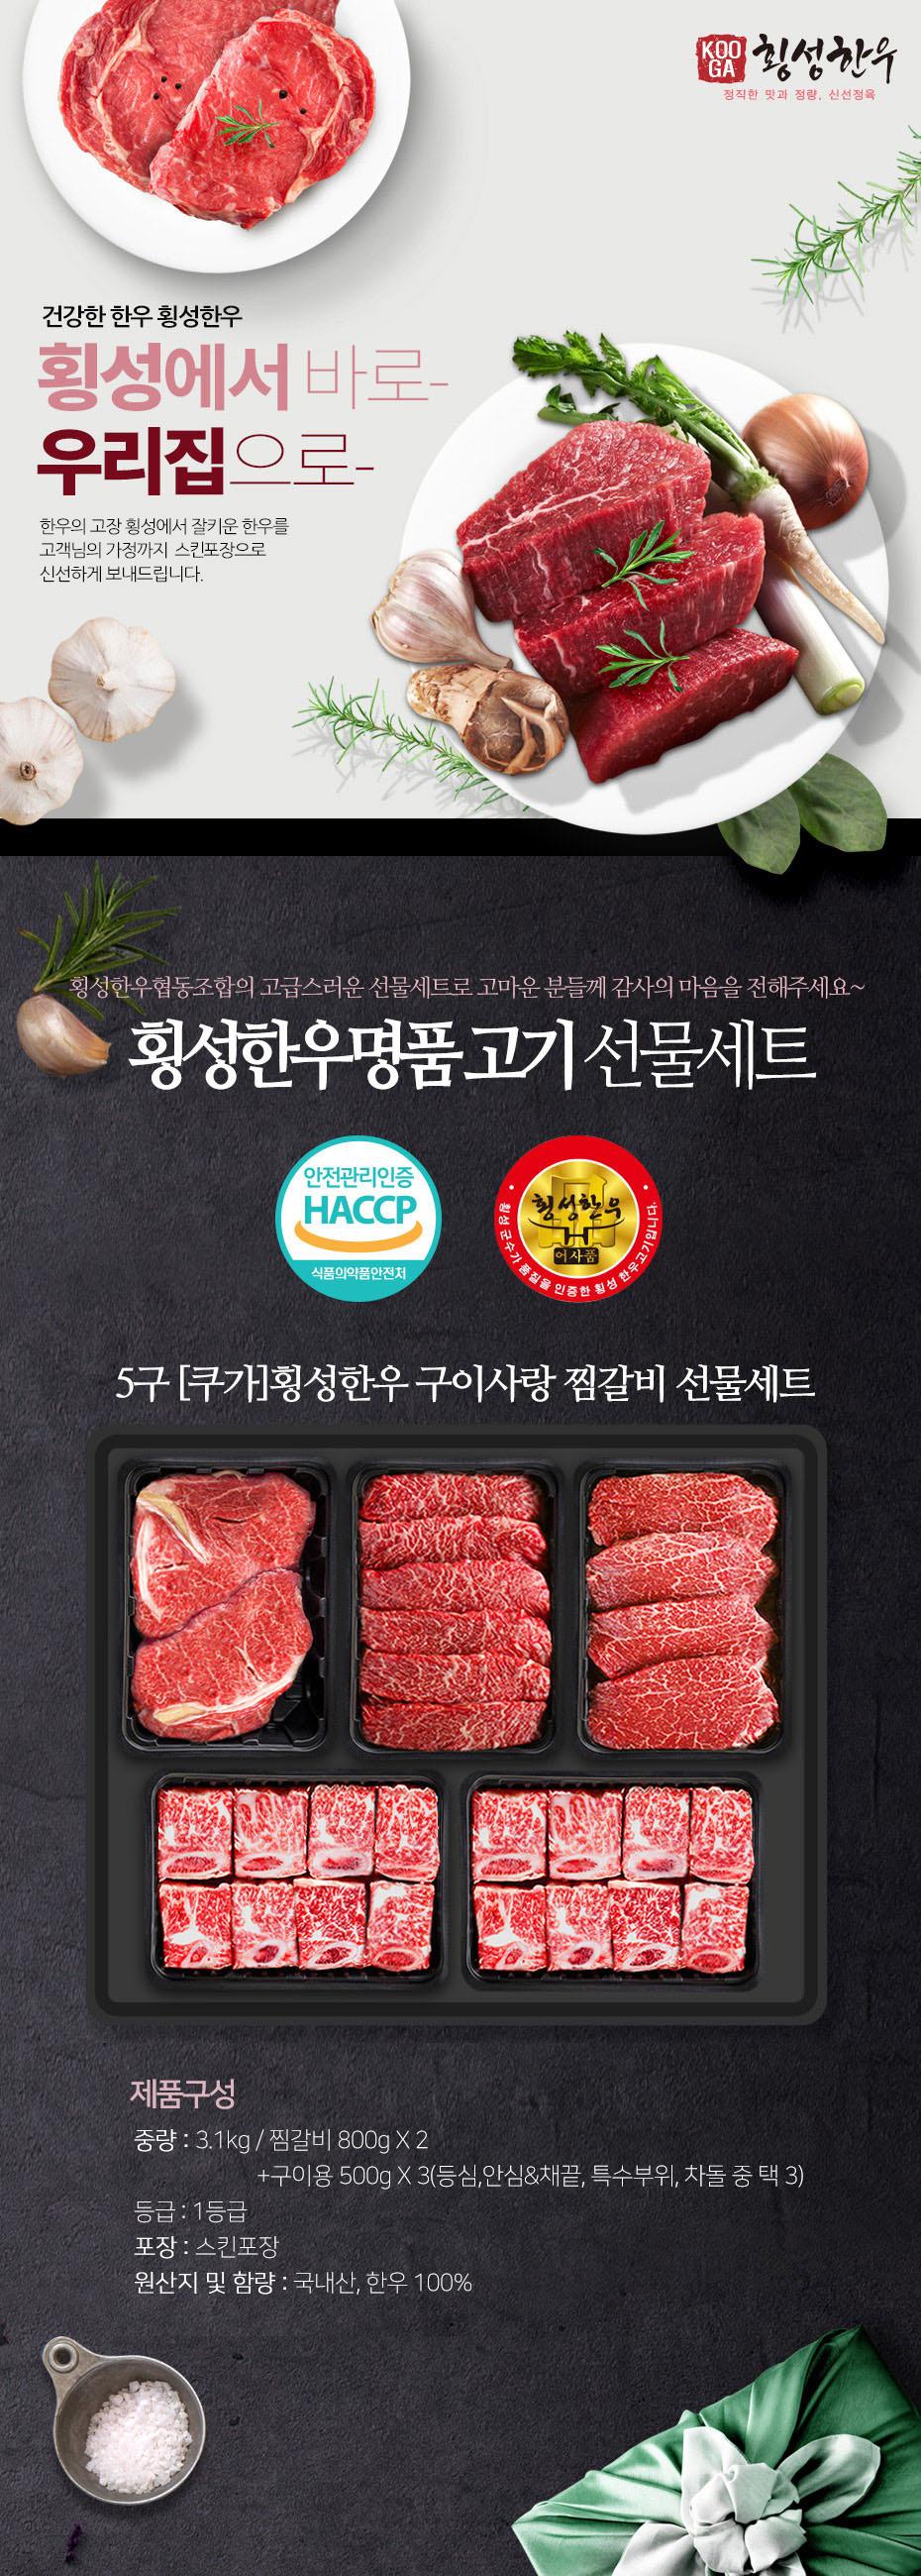 set5_meat_rib2_ten3_222223_135833.jpg